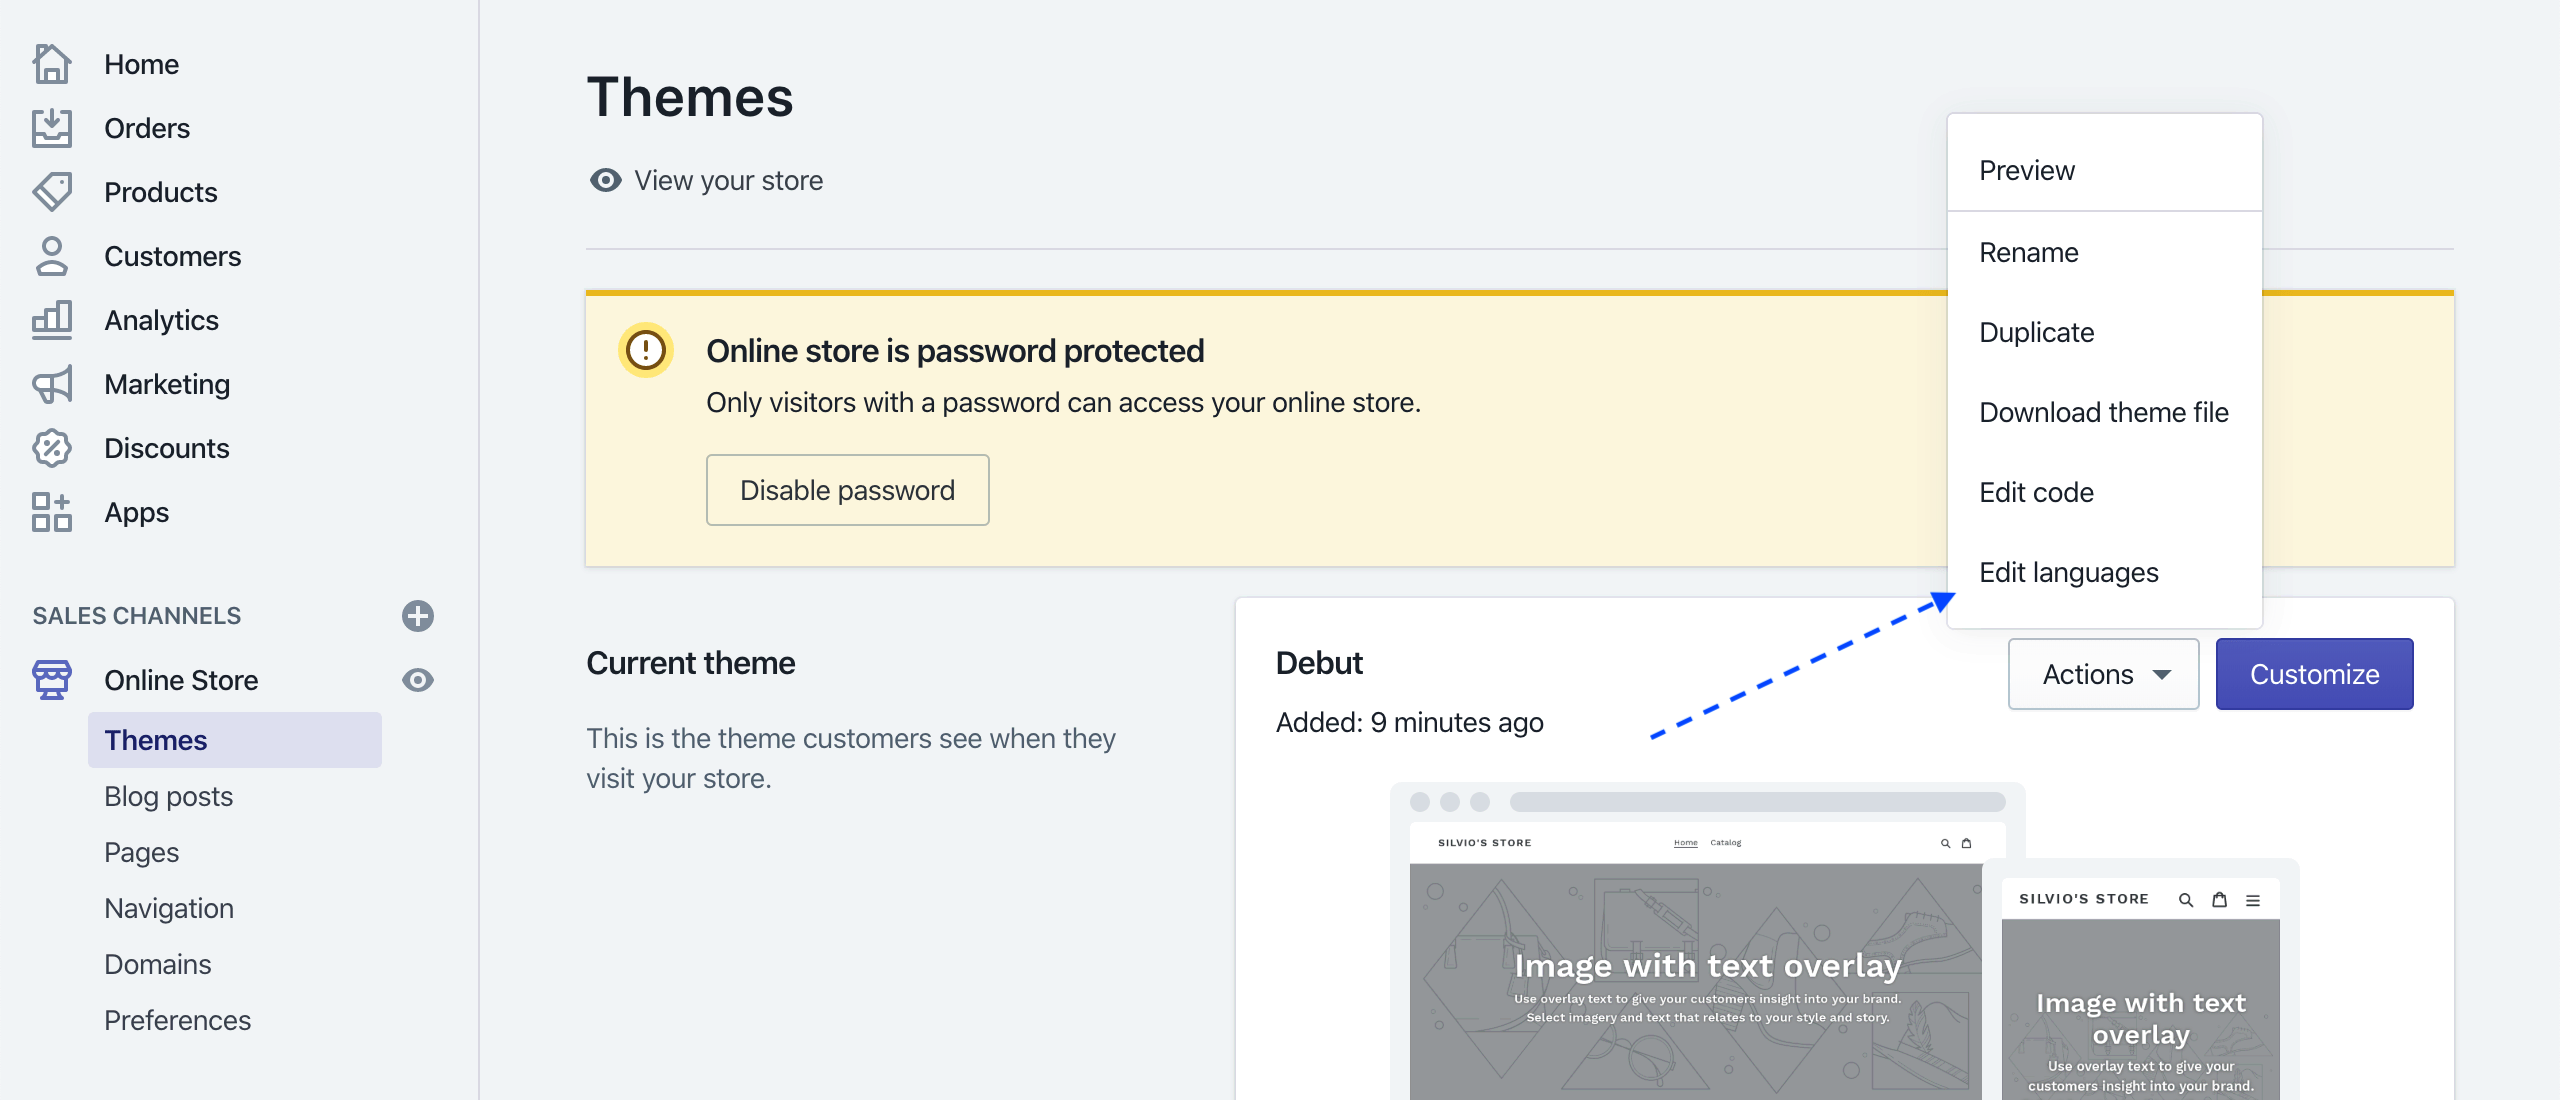 Shopify Themes: Select Edit Languages